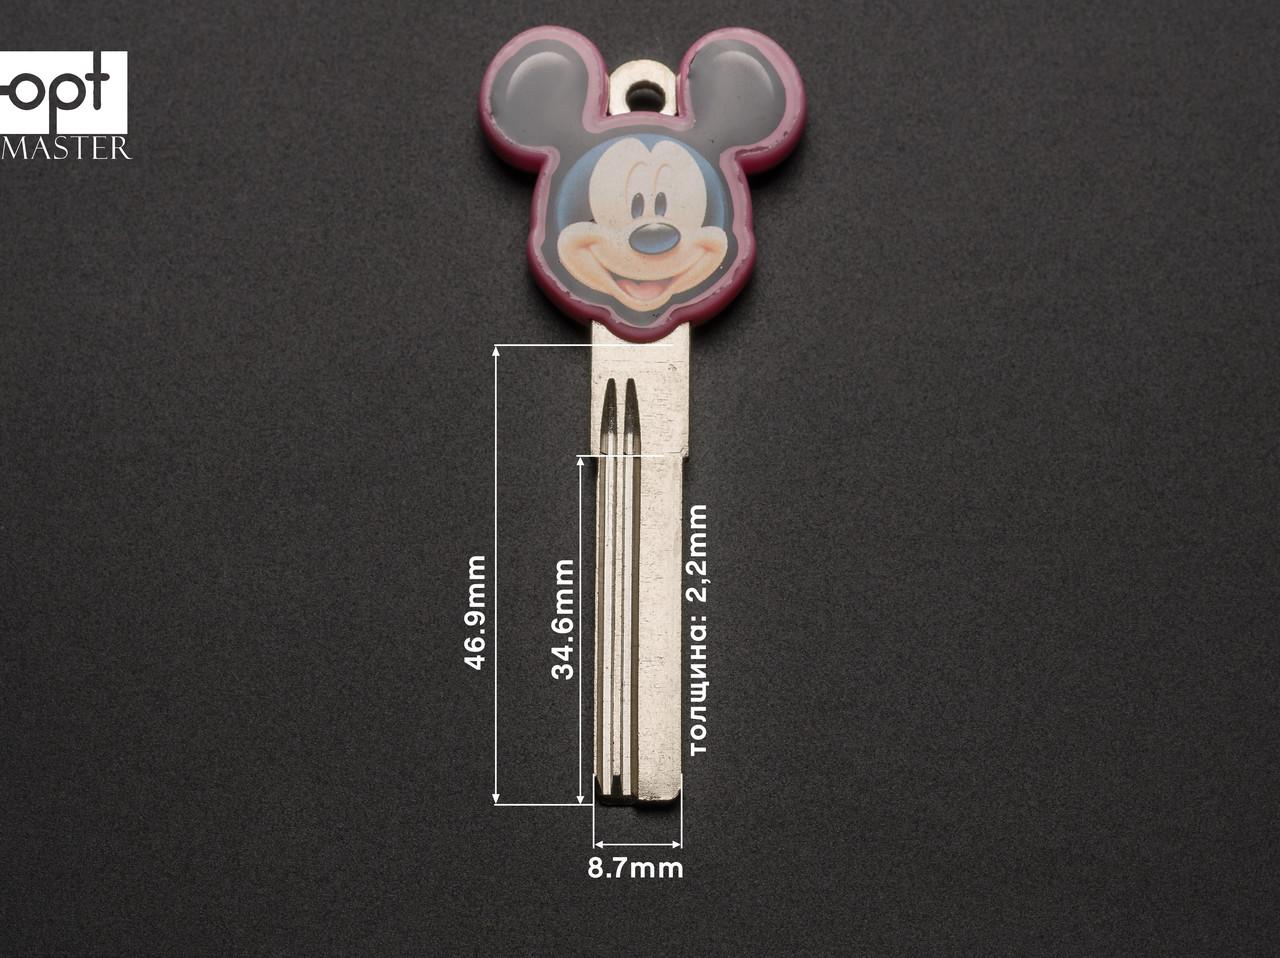 BAODEAN mickey mouse розовый (латунь) заготовка ключа